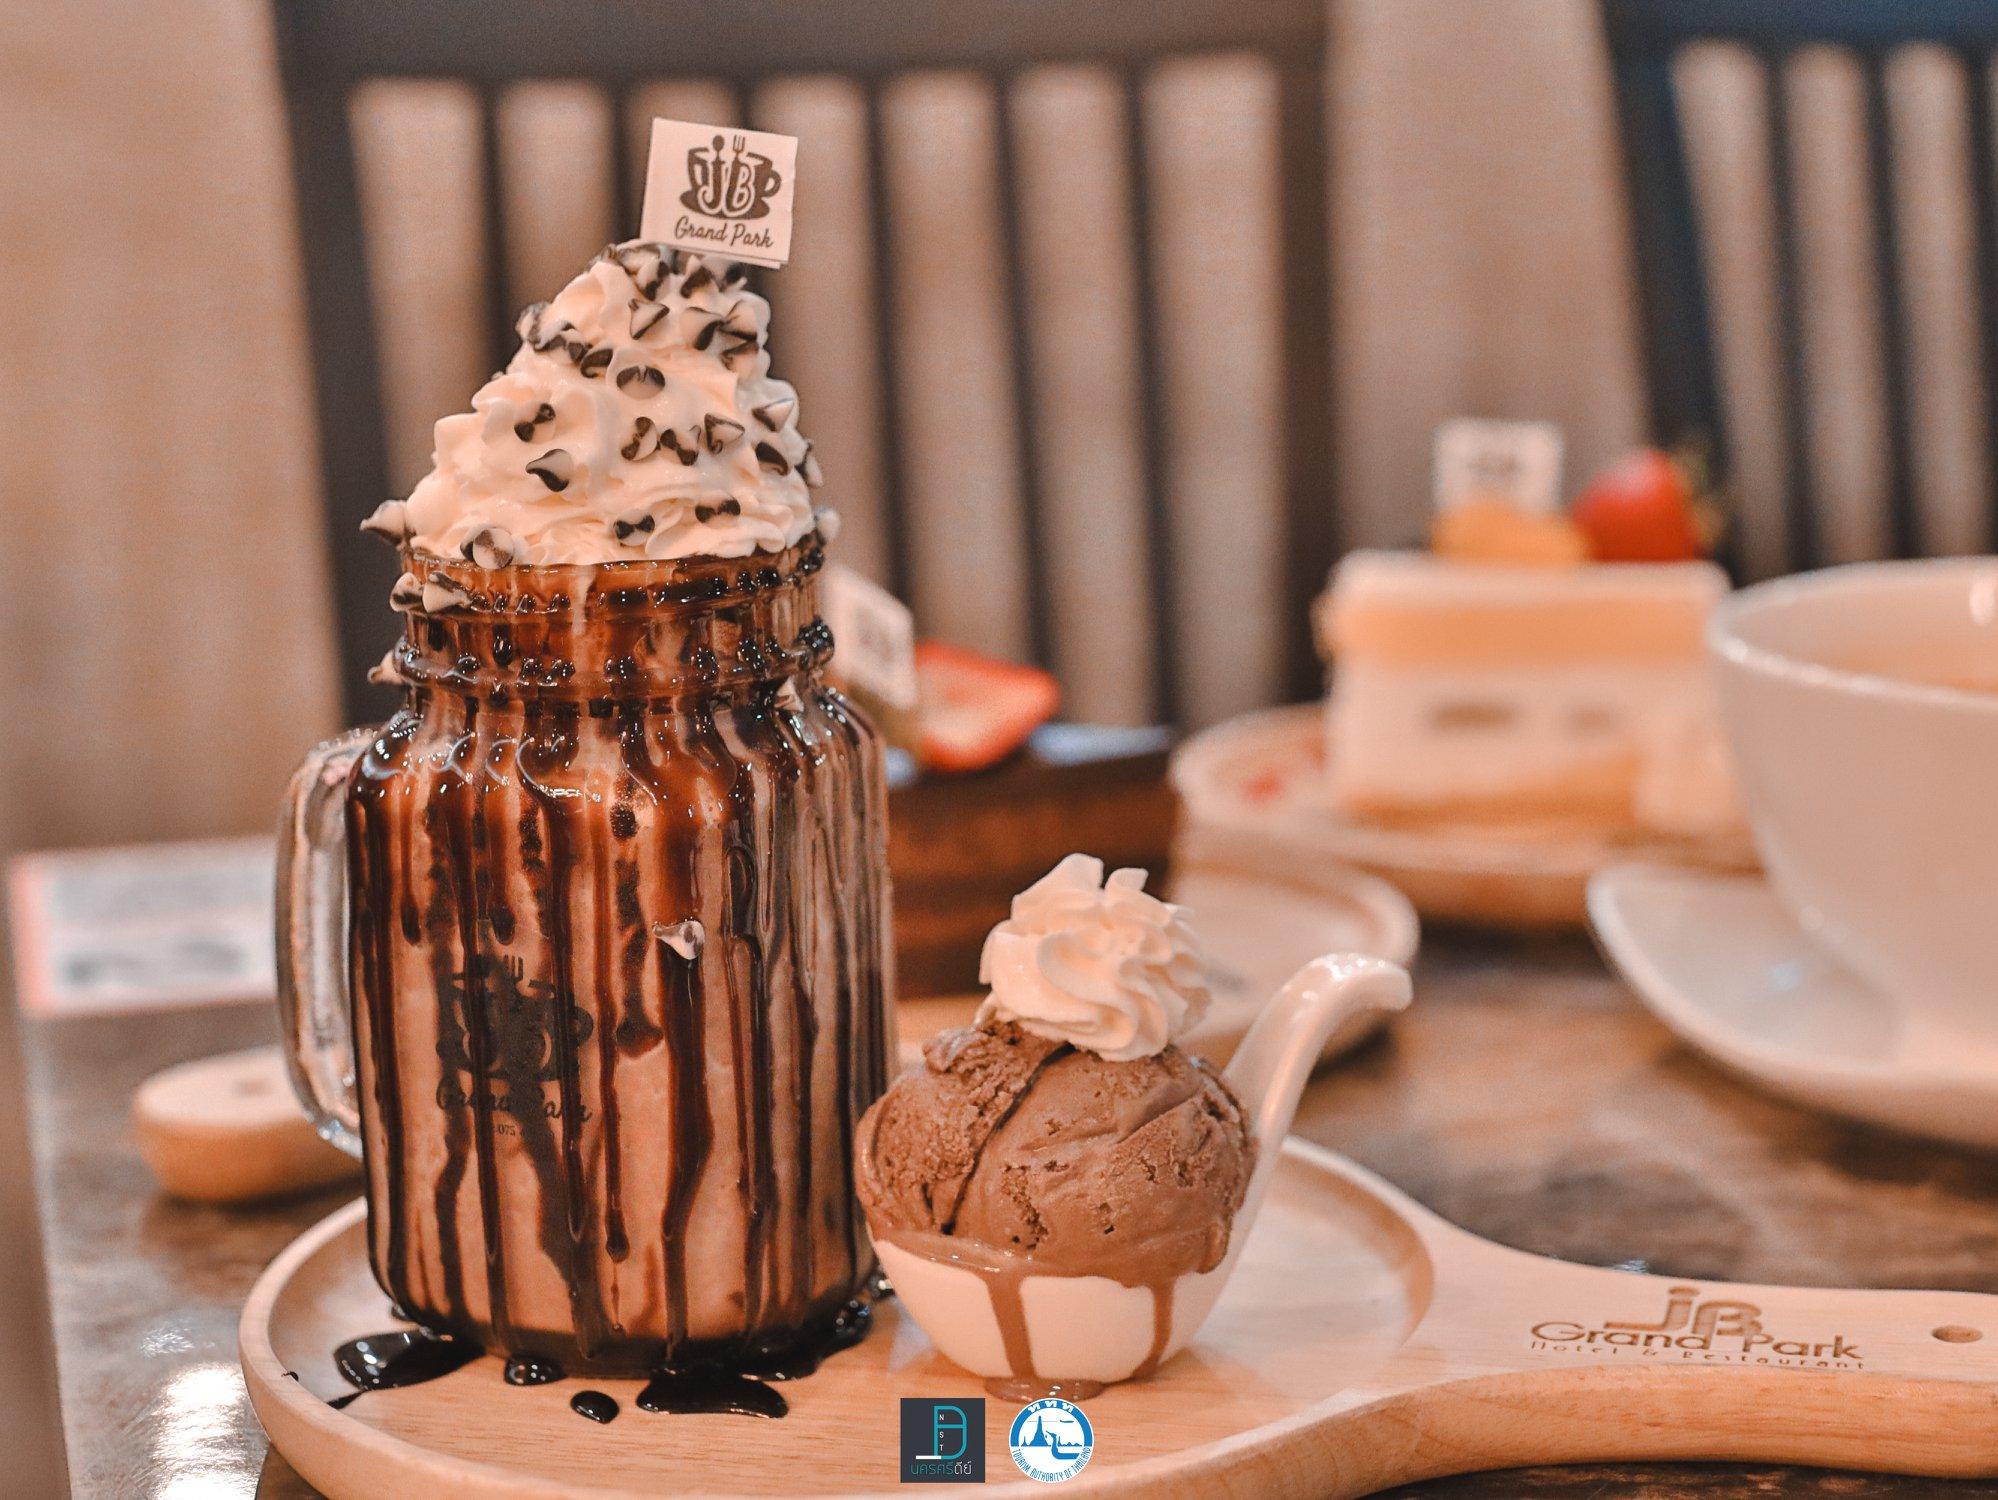 16.-JB-Grand-Park-ร้านนี้สั่งแล้วจัดเต็มอร่อยเข้ม-แถมไอติมด้วยยย โกโก้,นครศรีธรรมราช,อร่อย,ergo,coffee,ของกิน,เครื่องดื่ม,คาเฟ่